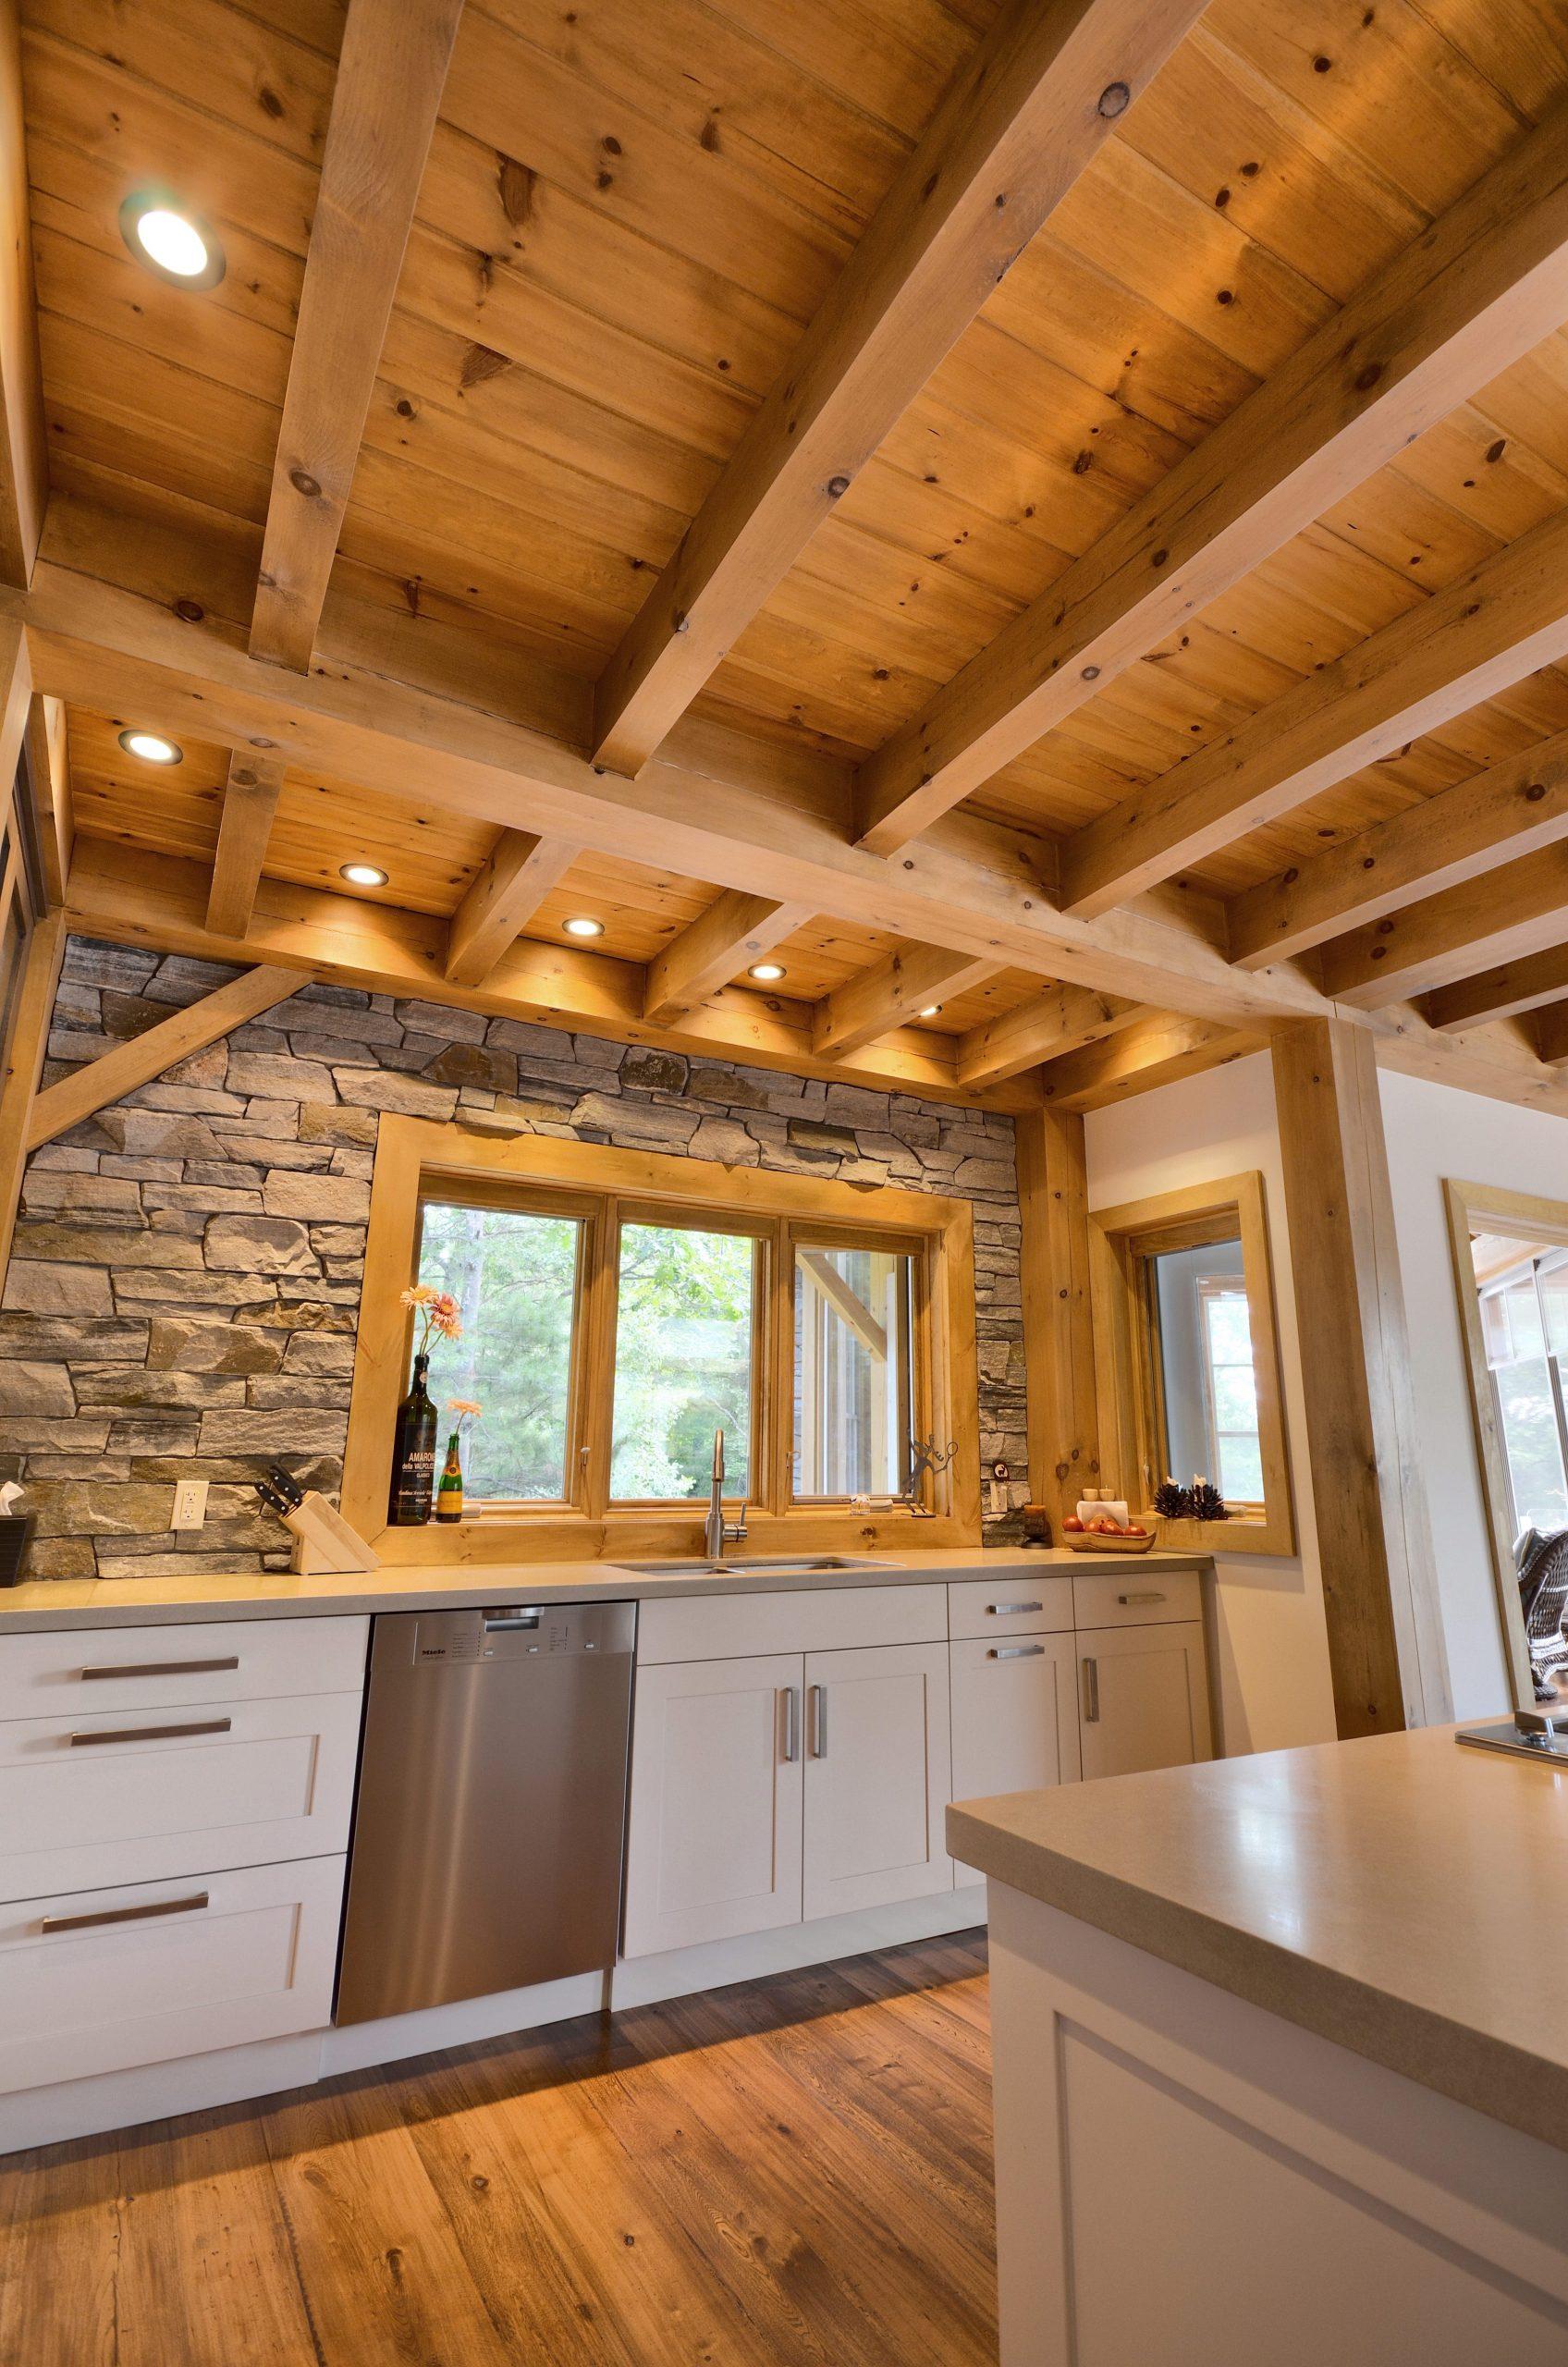 Normerica Timber Frame, Cottage, Interior, Kitchen